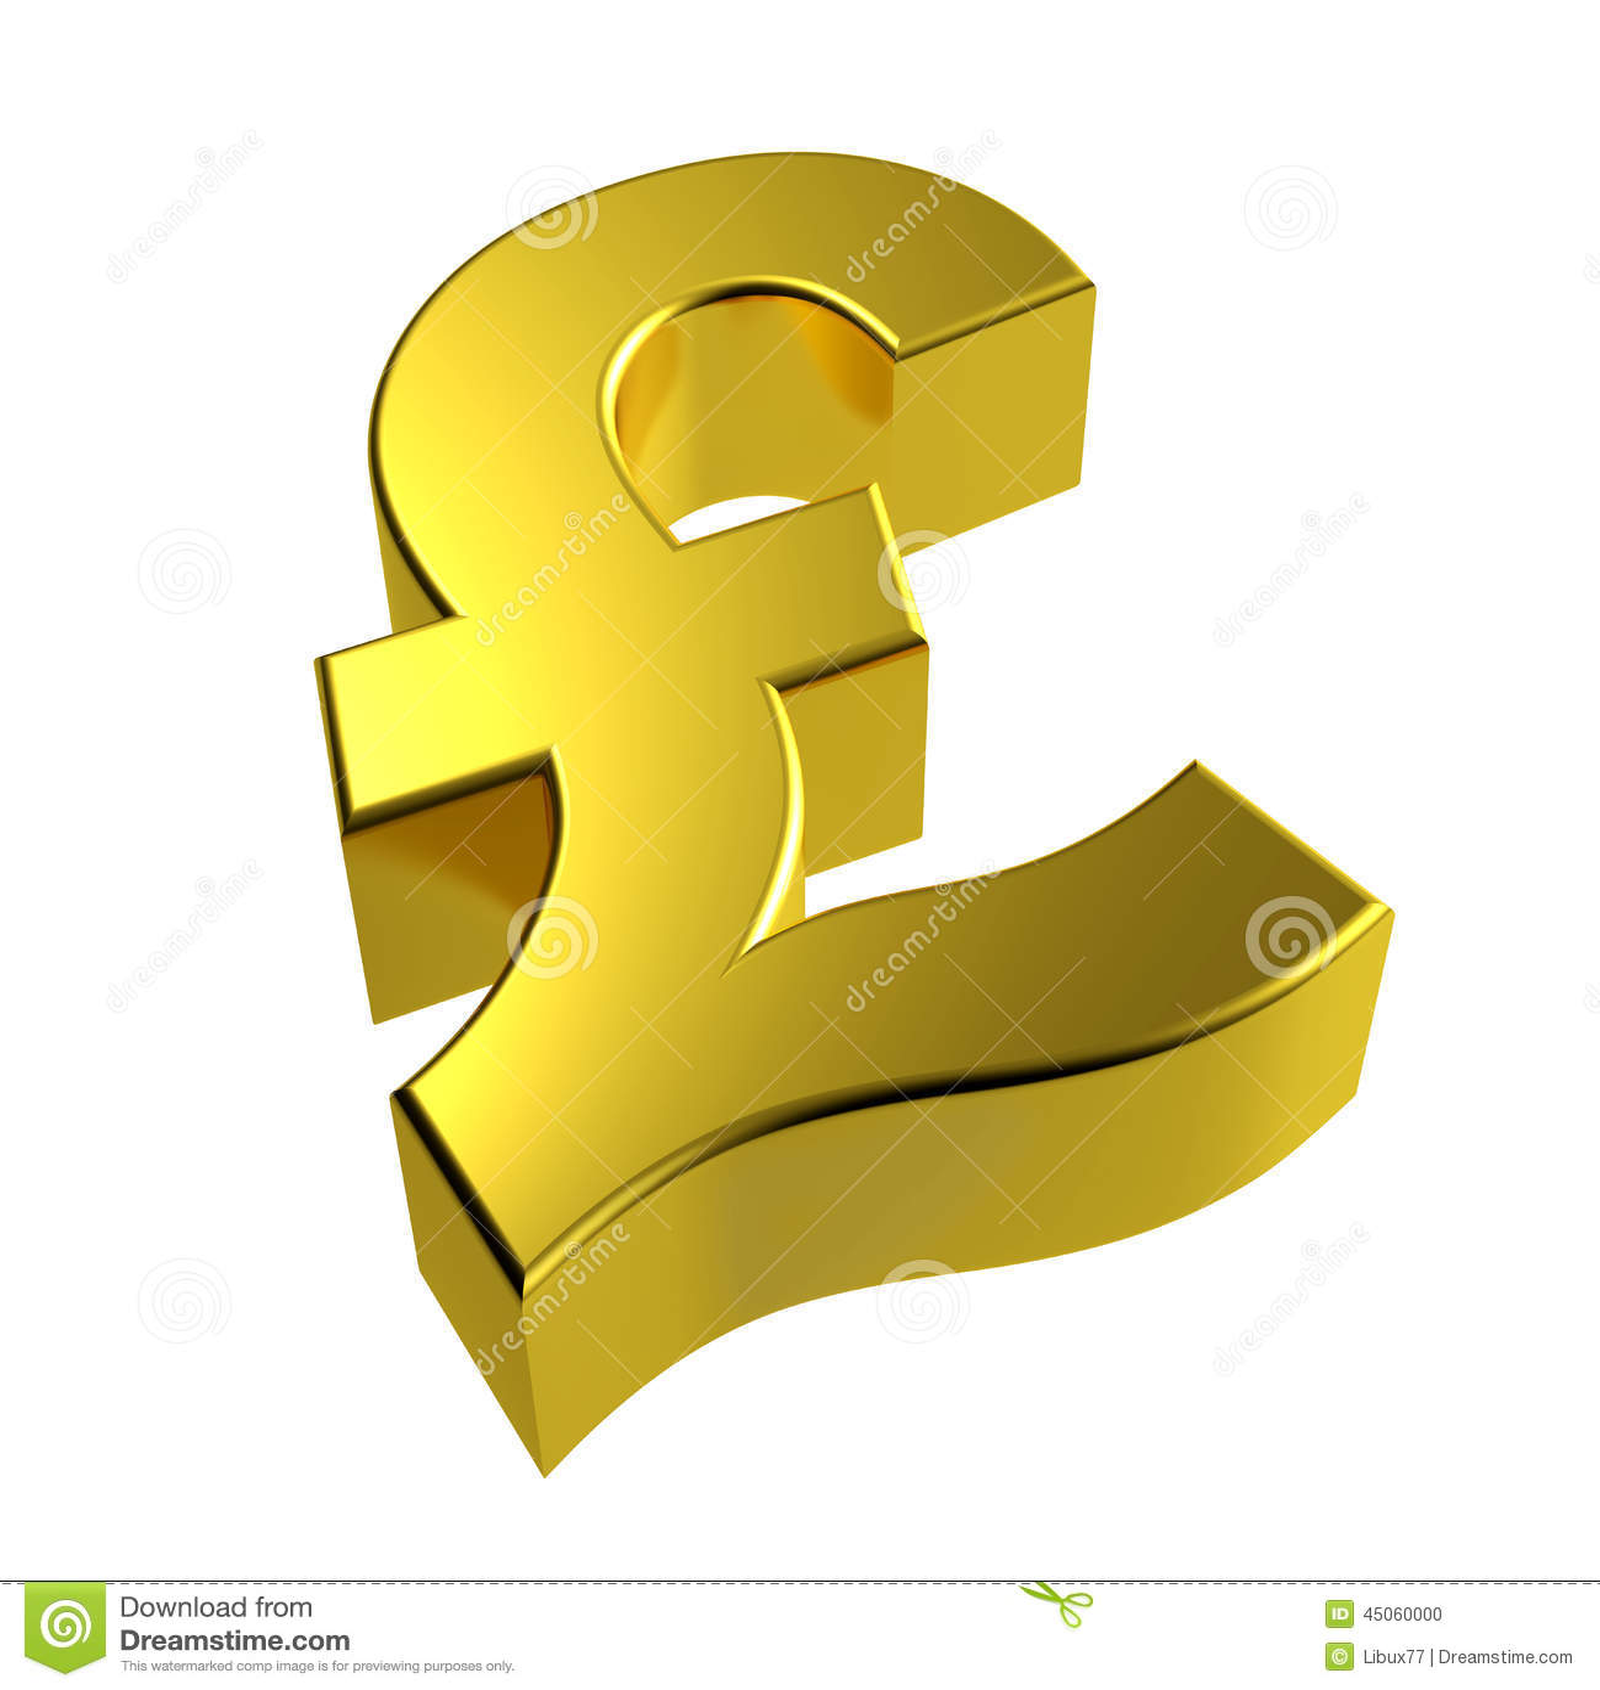 3d gold pound symbol golden british stock illustration 3d gold pound symbol golden british biocorpaavc Choice Image